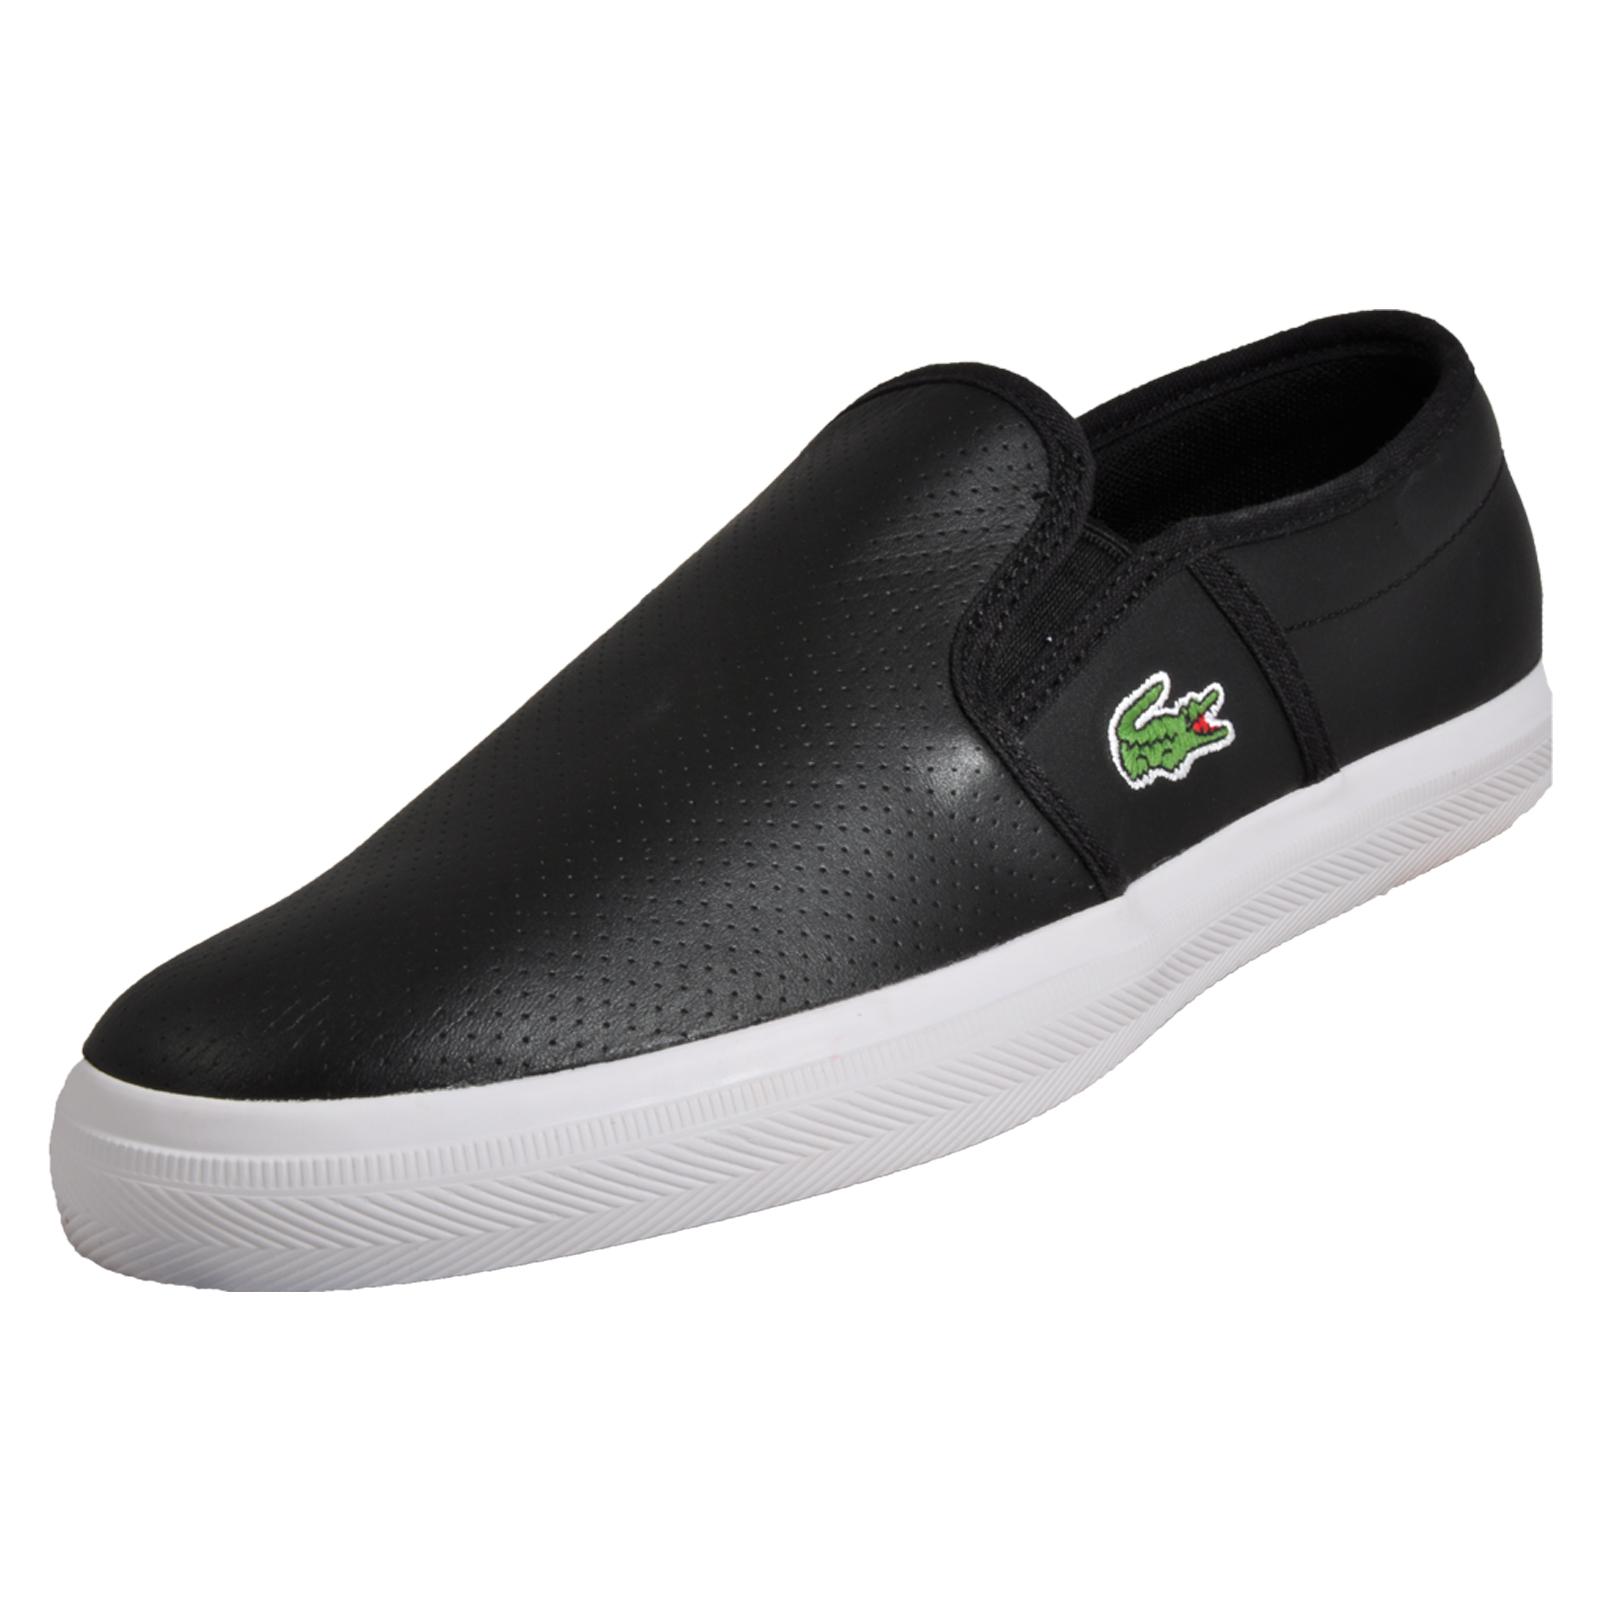 58f10618c Details about Lacoste Gazon Men s Slip-on Designer Classic Leather Trainers  Black B Grade